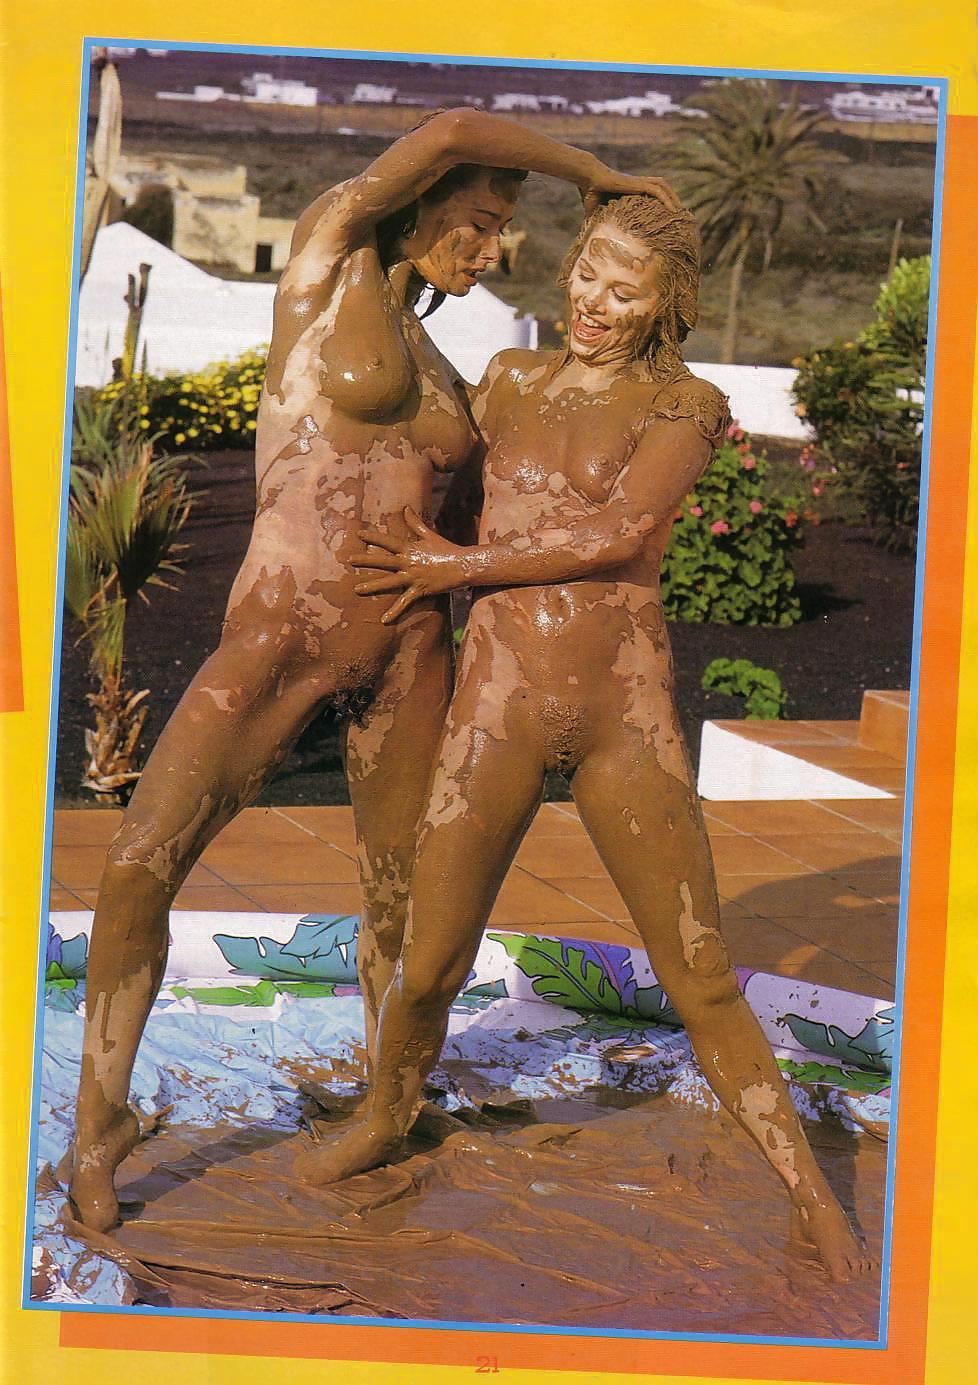 Mud fight nude